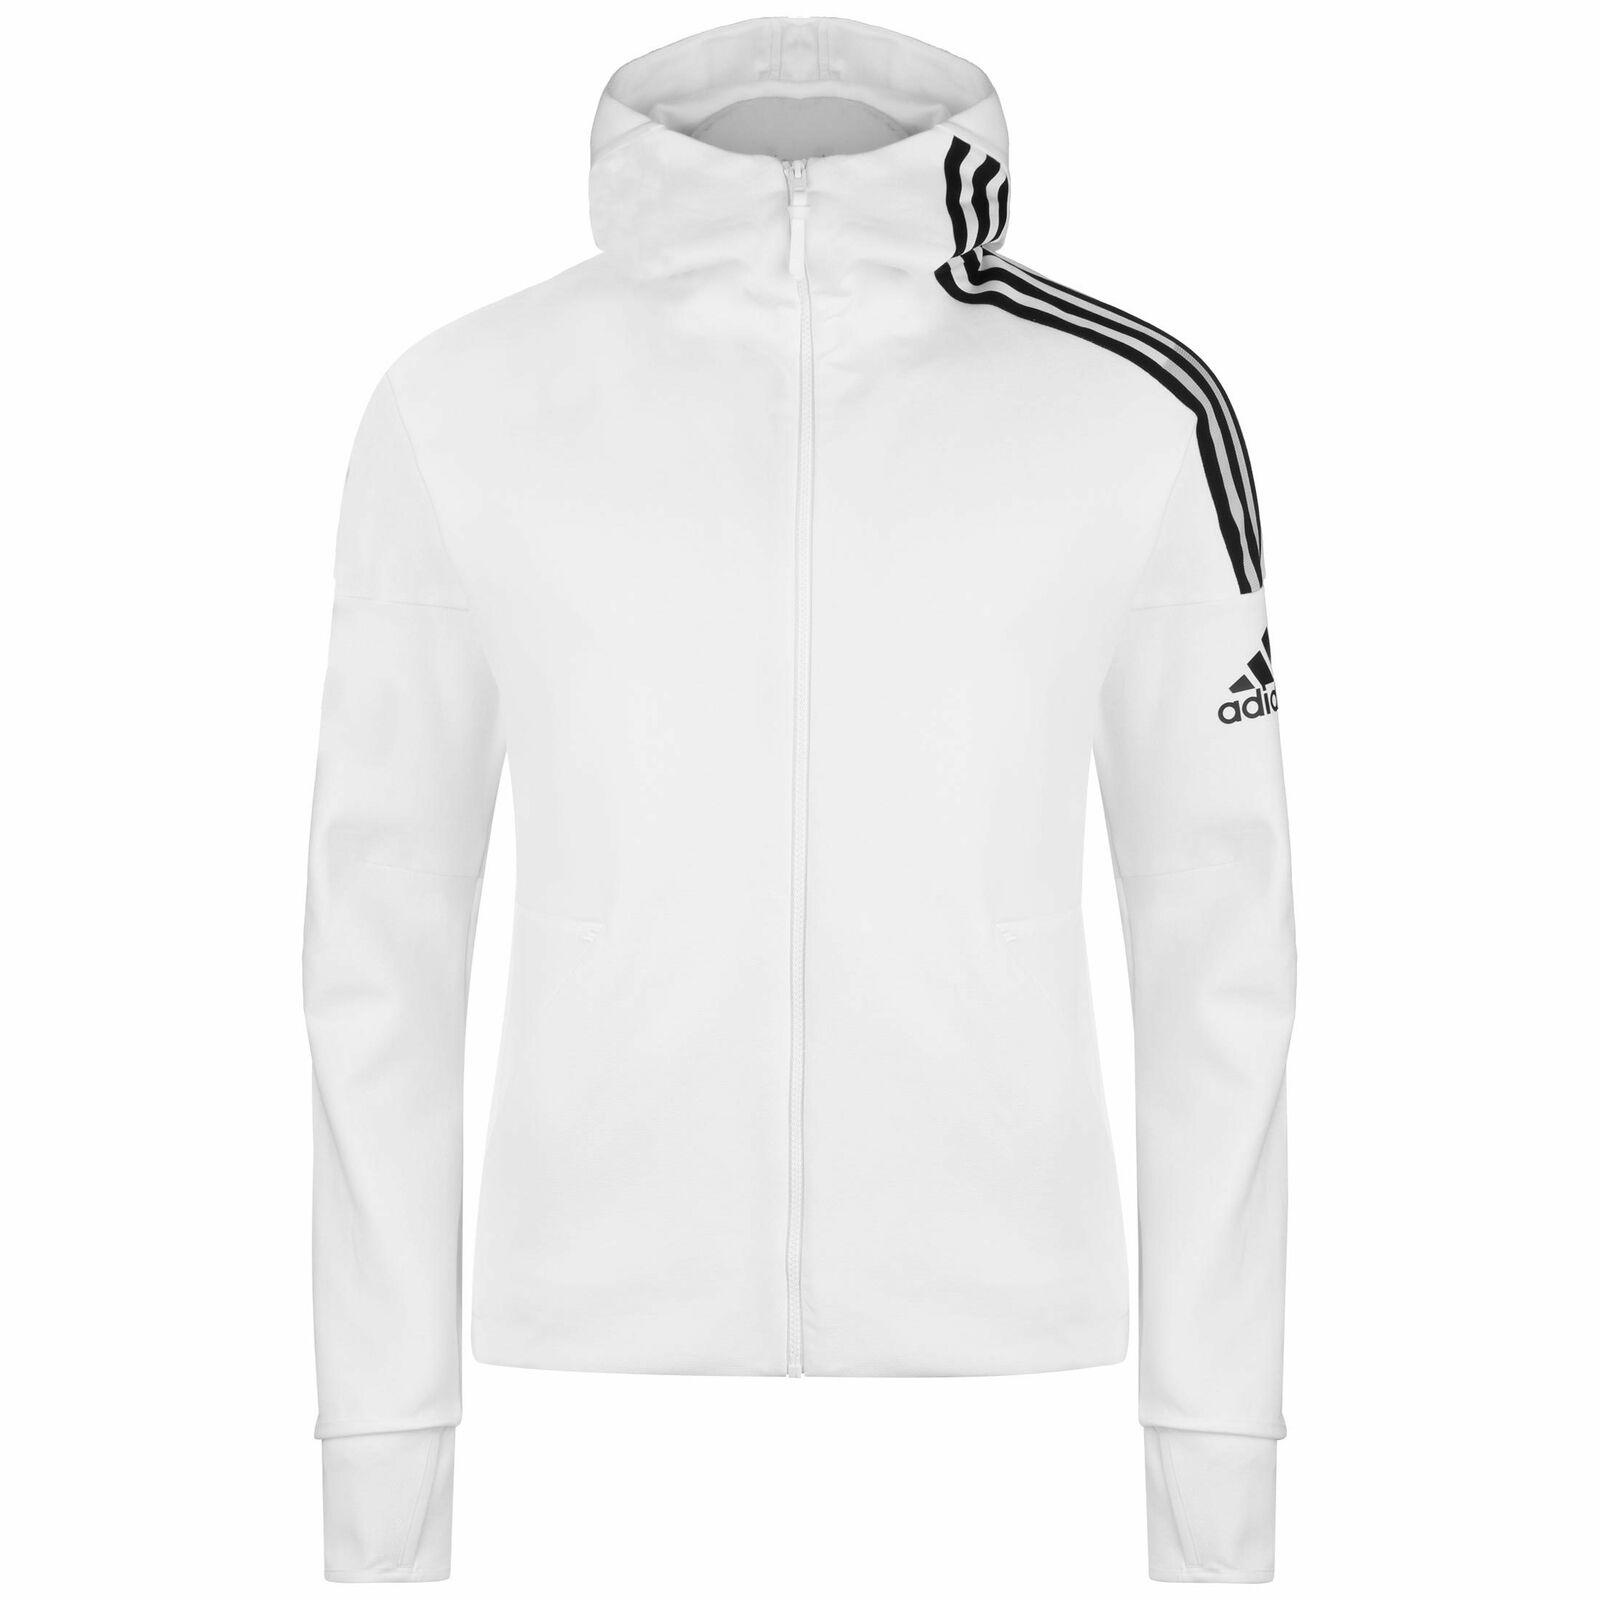 Adidas Performance Z.N.E. 3-Stripes Kapuzensweatjacke Herren NEU Hoodie